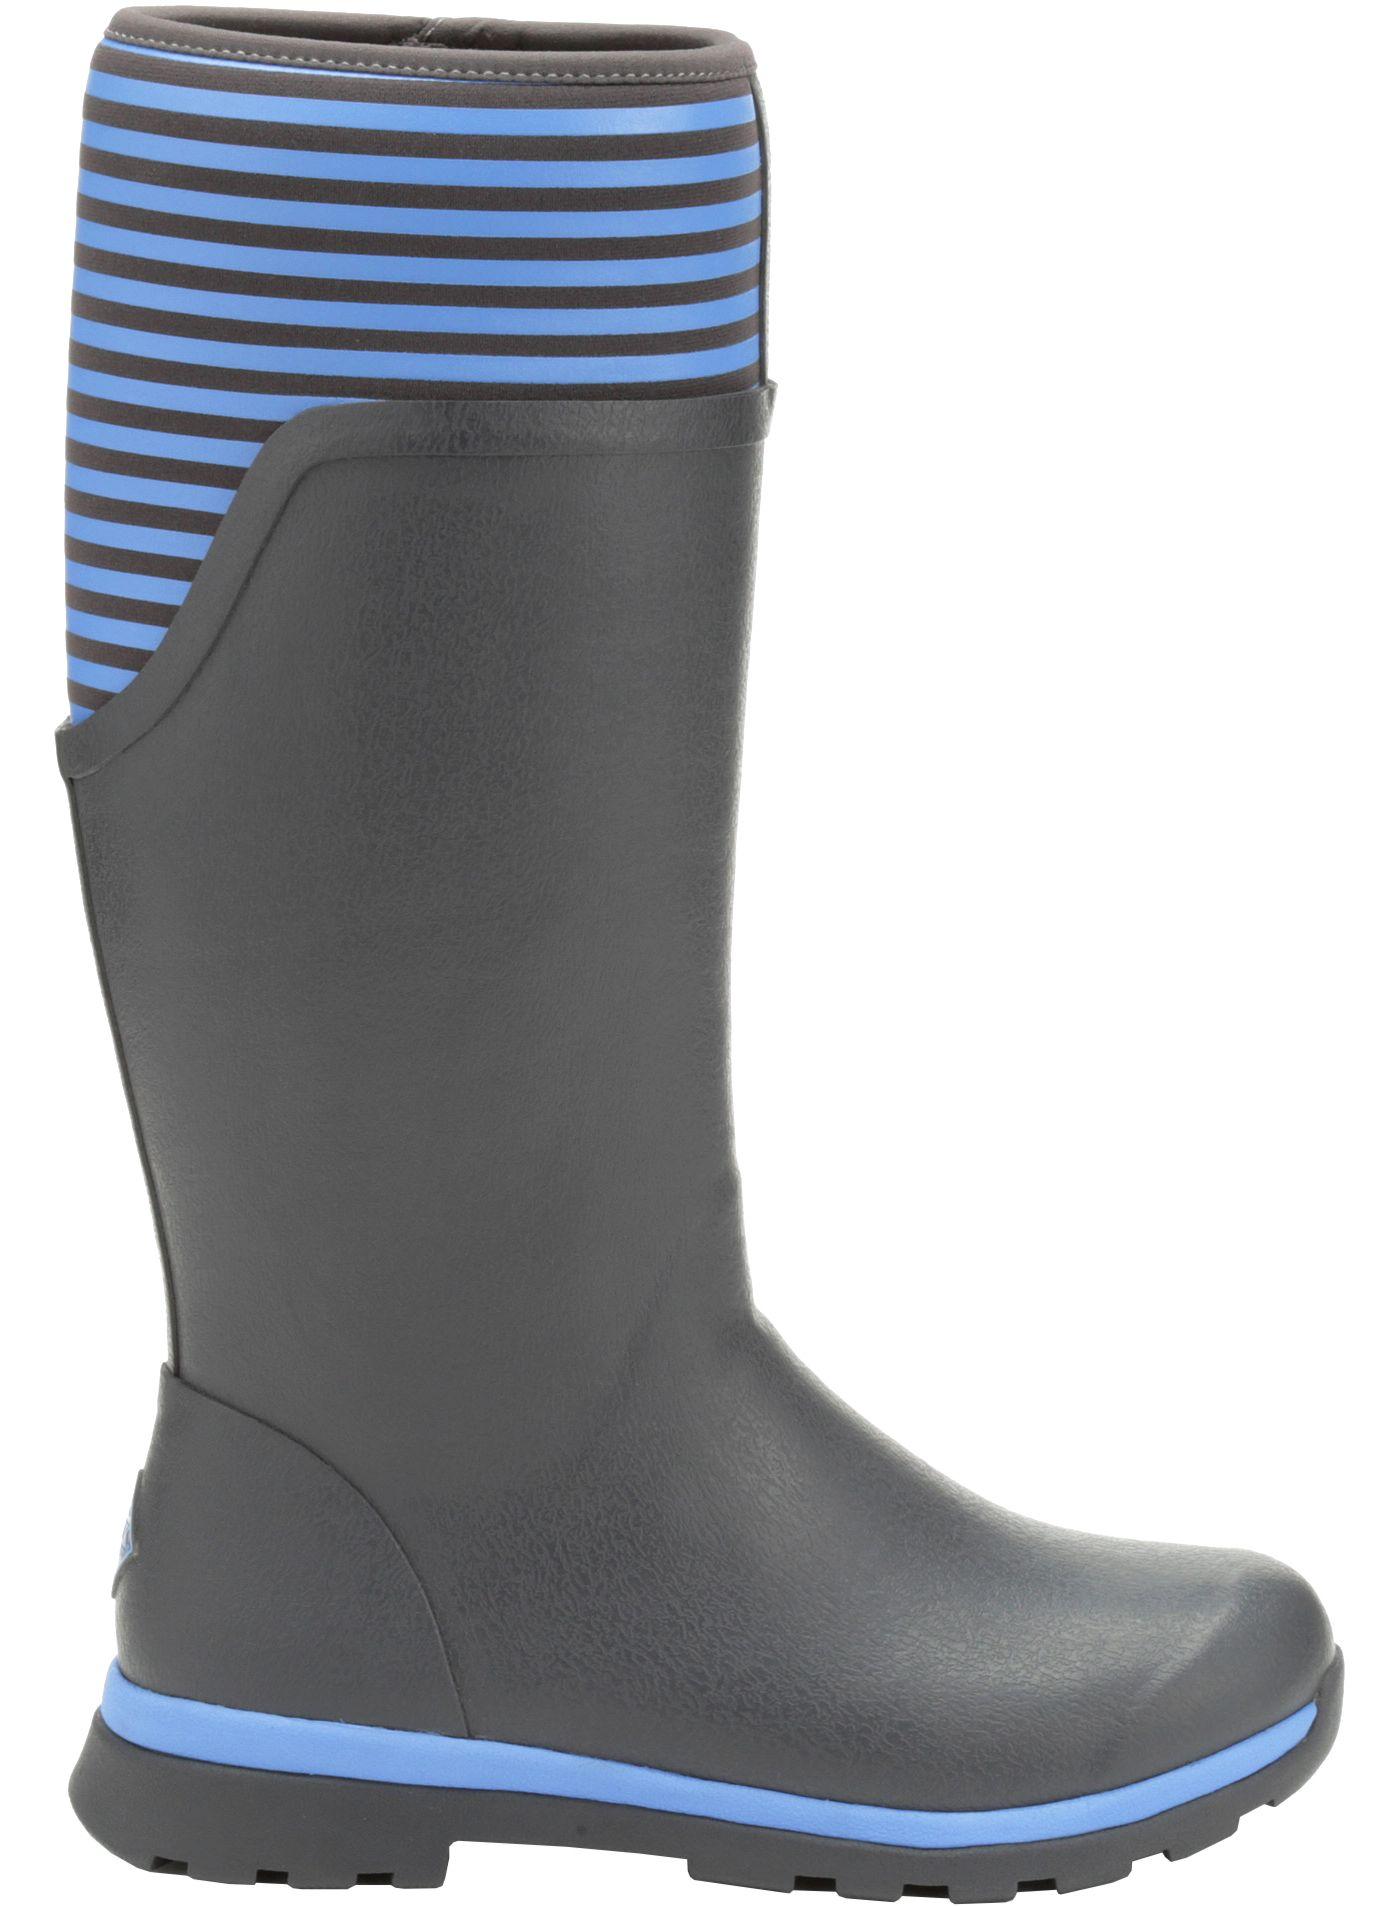 Muck Boots Women's Cambridge Stripe Tall Rain Boots